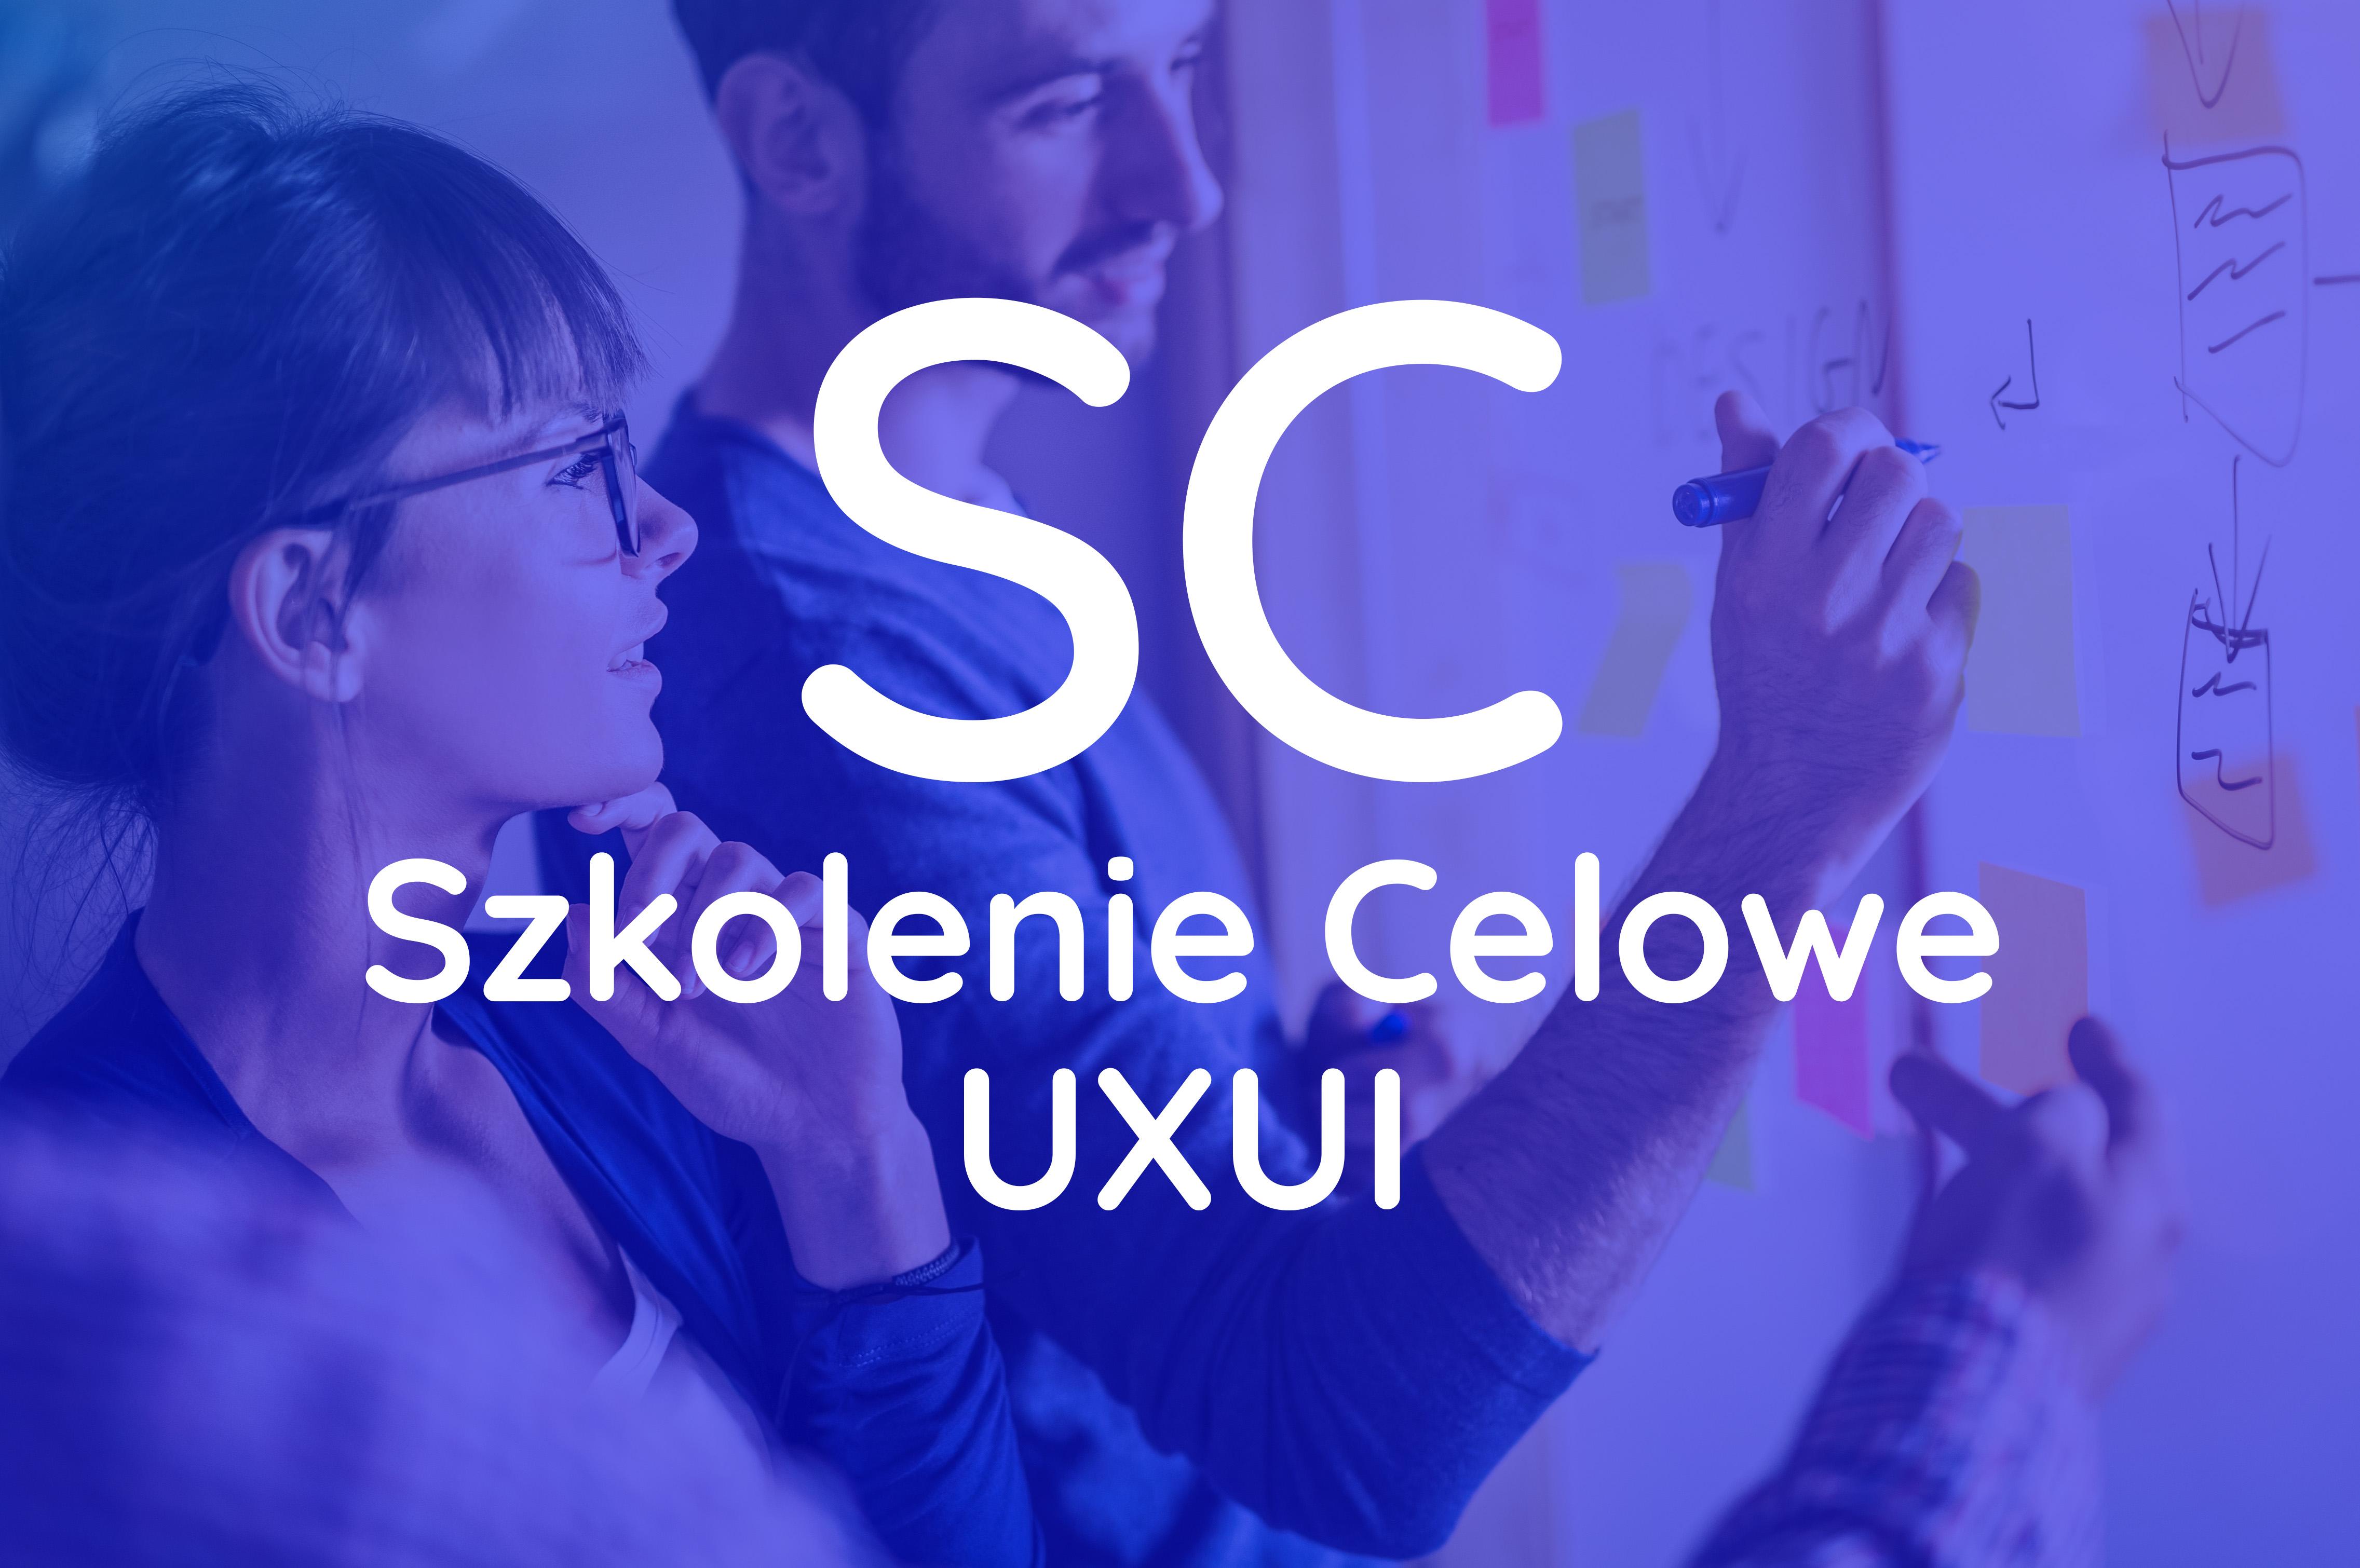 Skoelnie Celowe UXUI